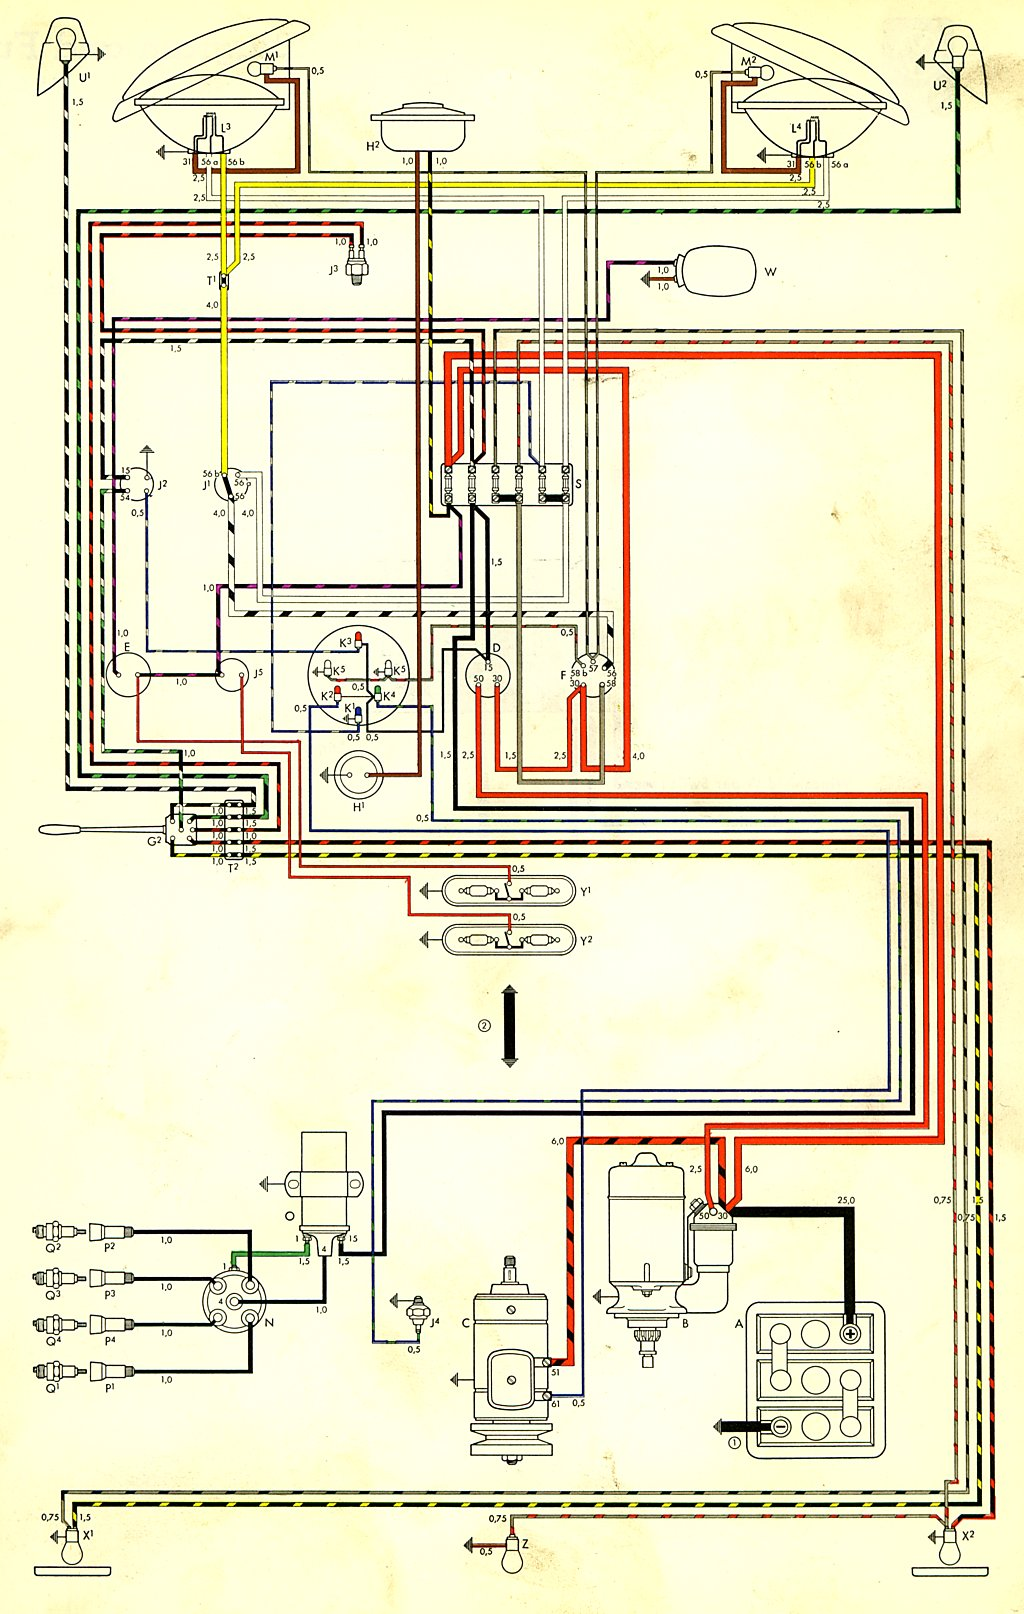 56 Buick Wiring Diagram Thesamba Com Type 2 Wiring Diagrams